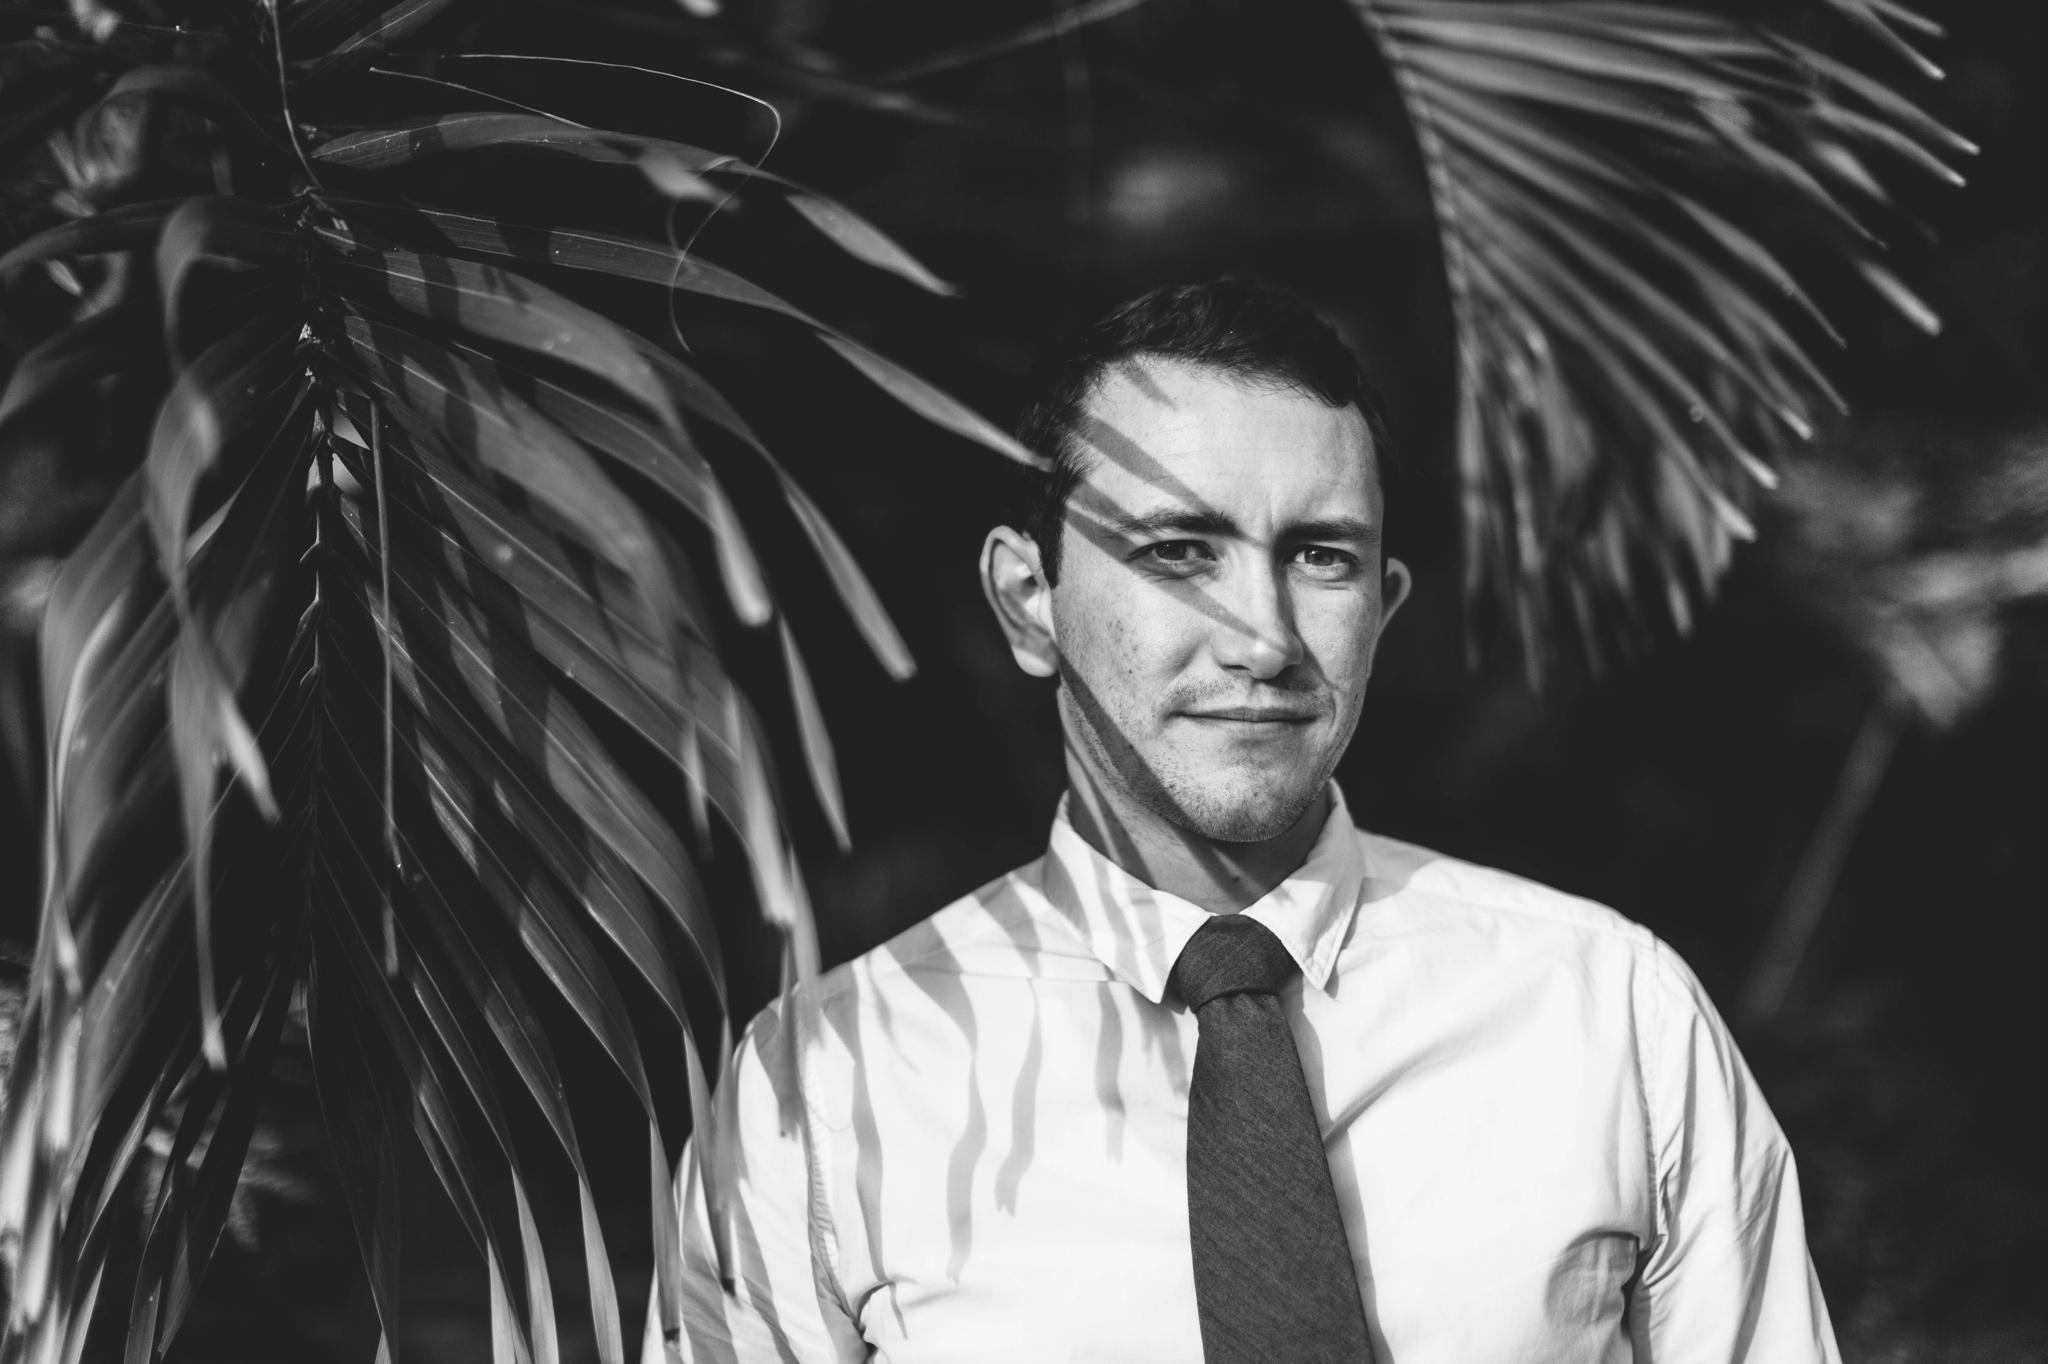 Portrait of the Groom in front of Palm Trees Ana + Elijah - Wedding at Loulu Palm in Haleiwa, HI - Oahu Hawaii Wedding Photographer - #hawaiiweddingphotographer #oahuweddings #hawaiiweddings